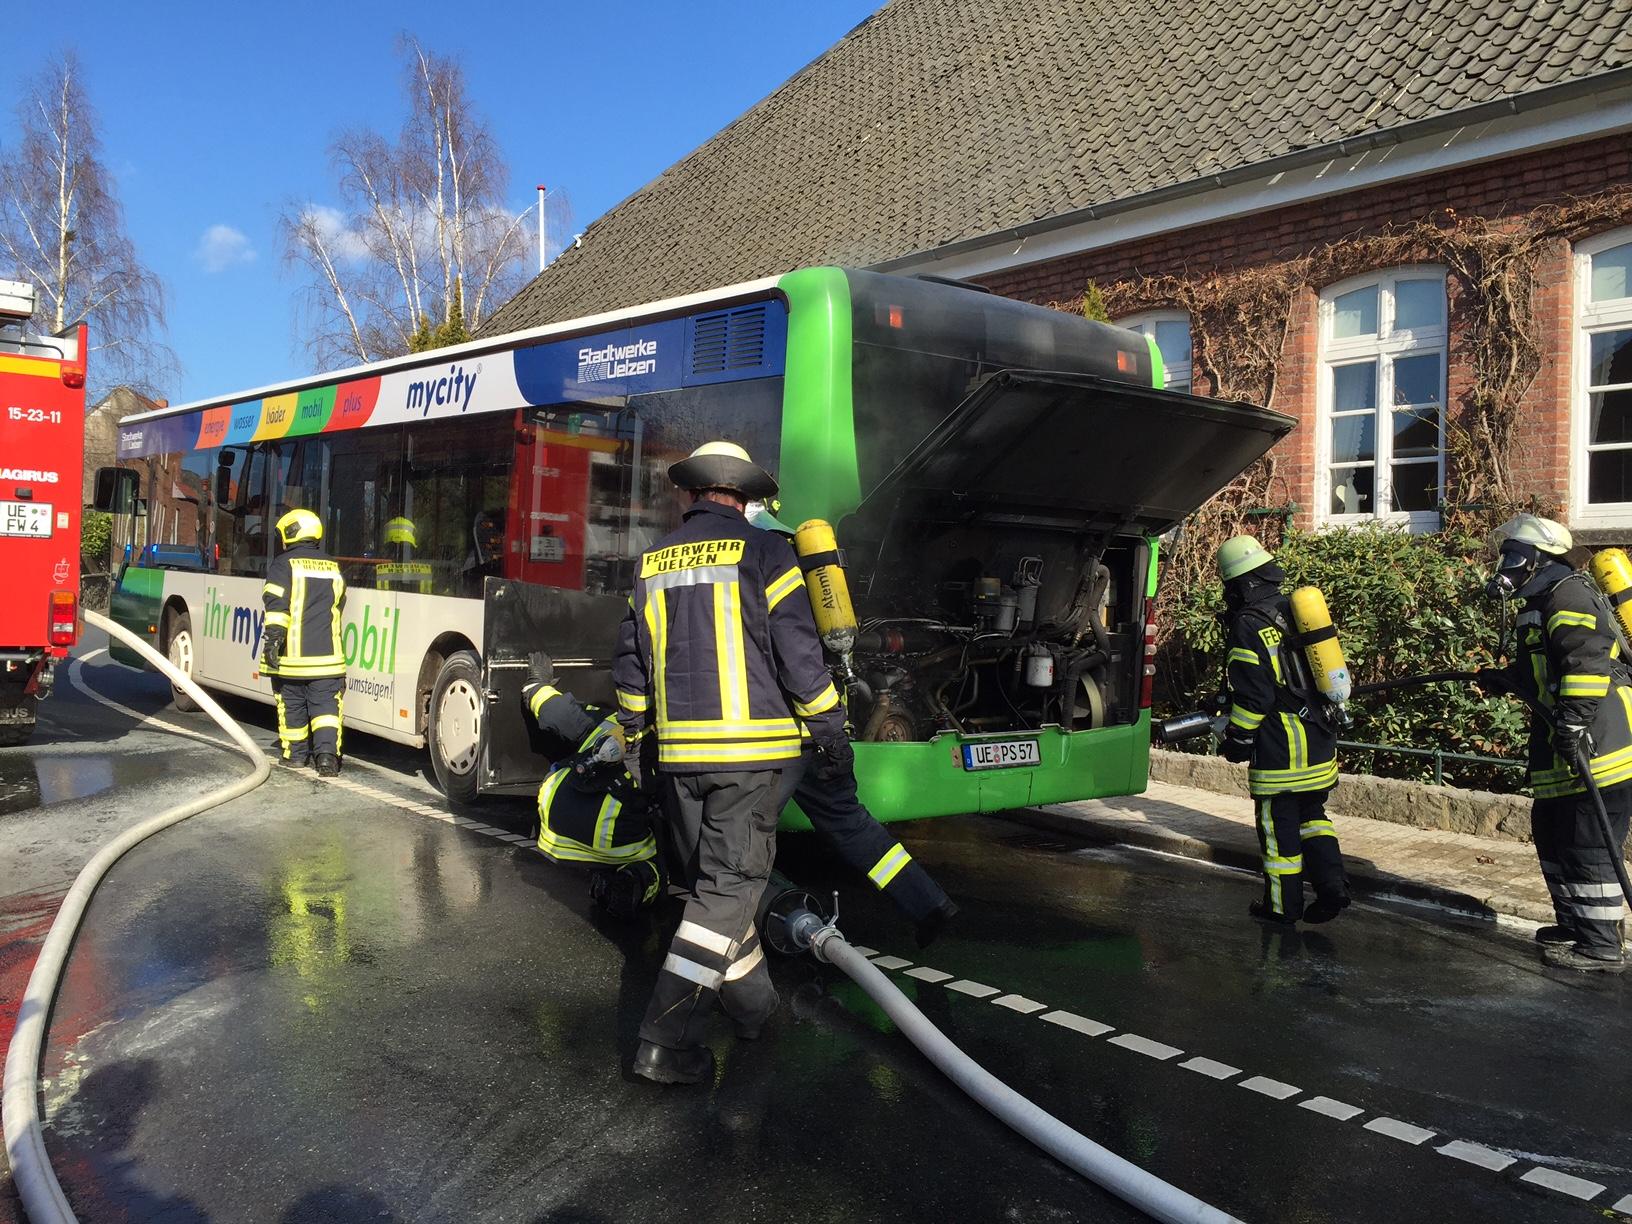 039. Motorbrand - Stadtbus